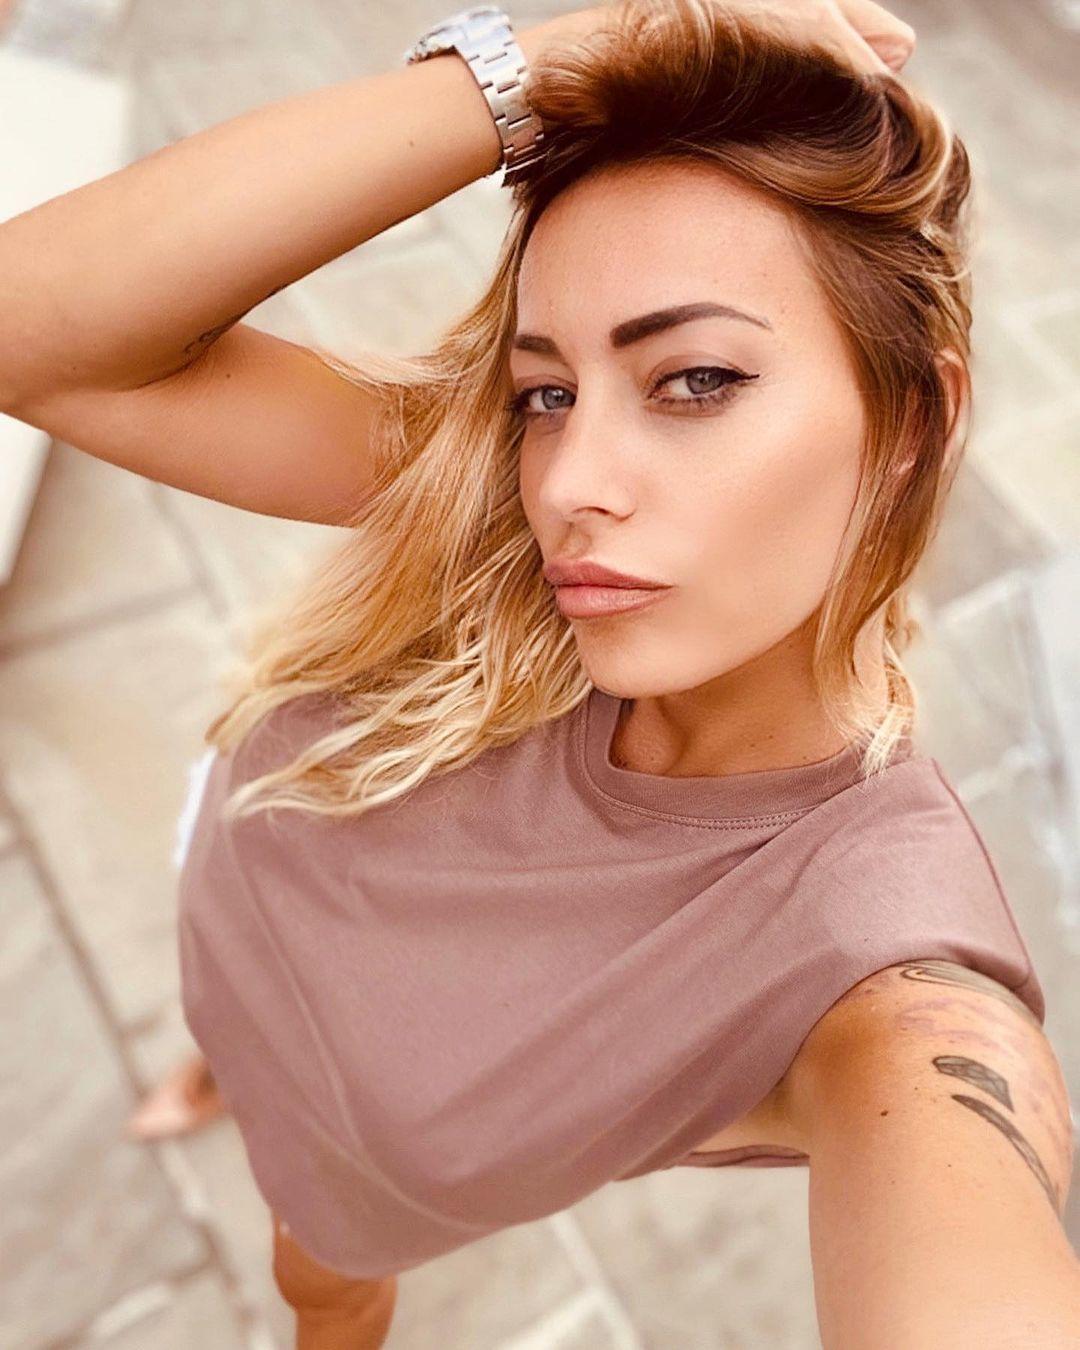 Karina-Cascella-Wallpapers-Insta-Fit-Bio-7